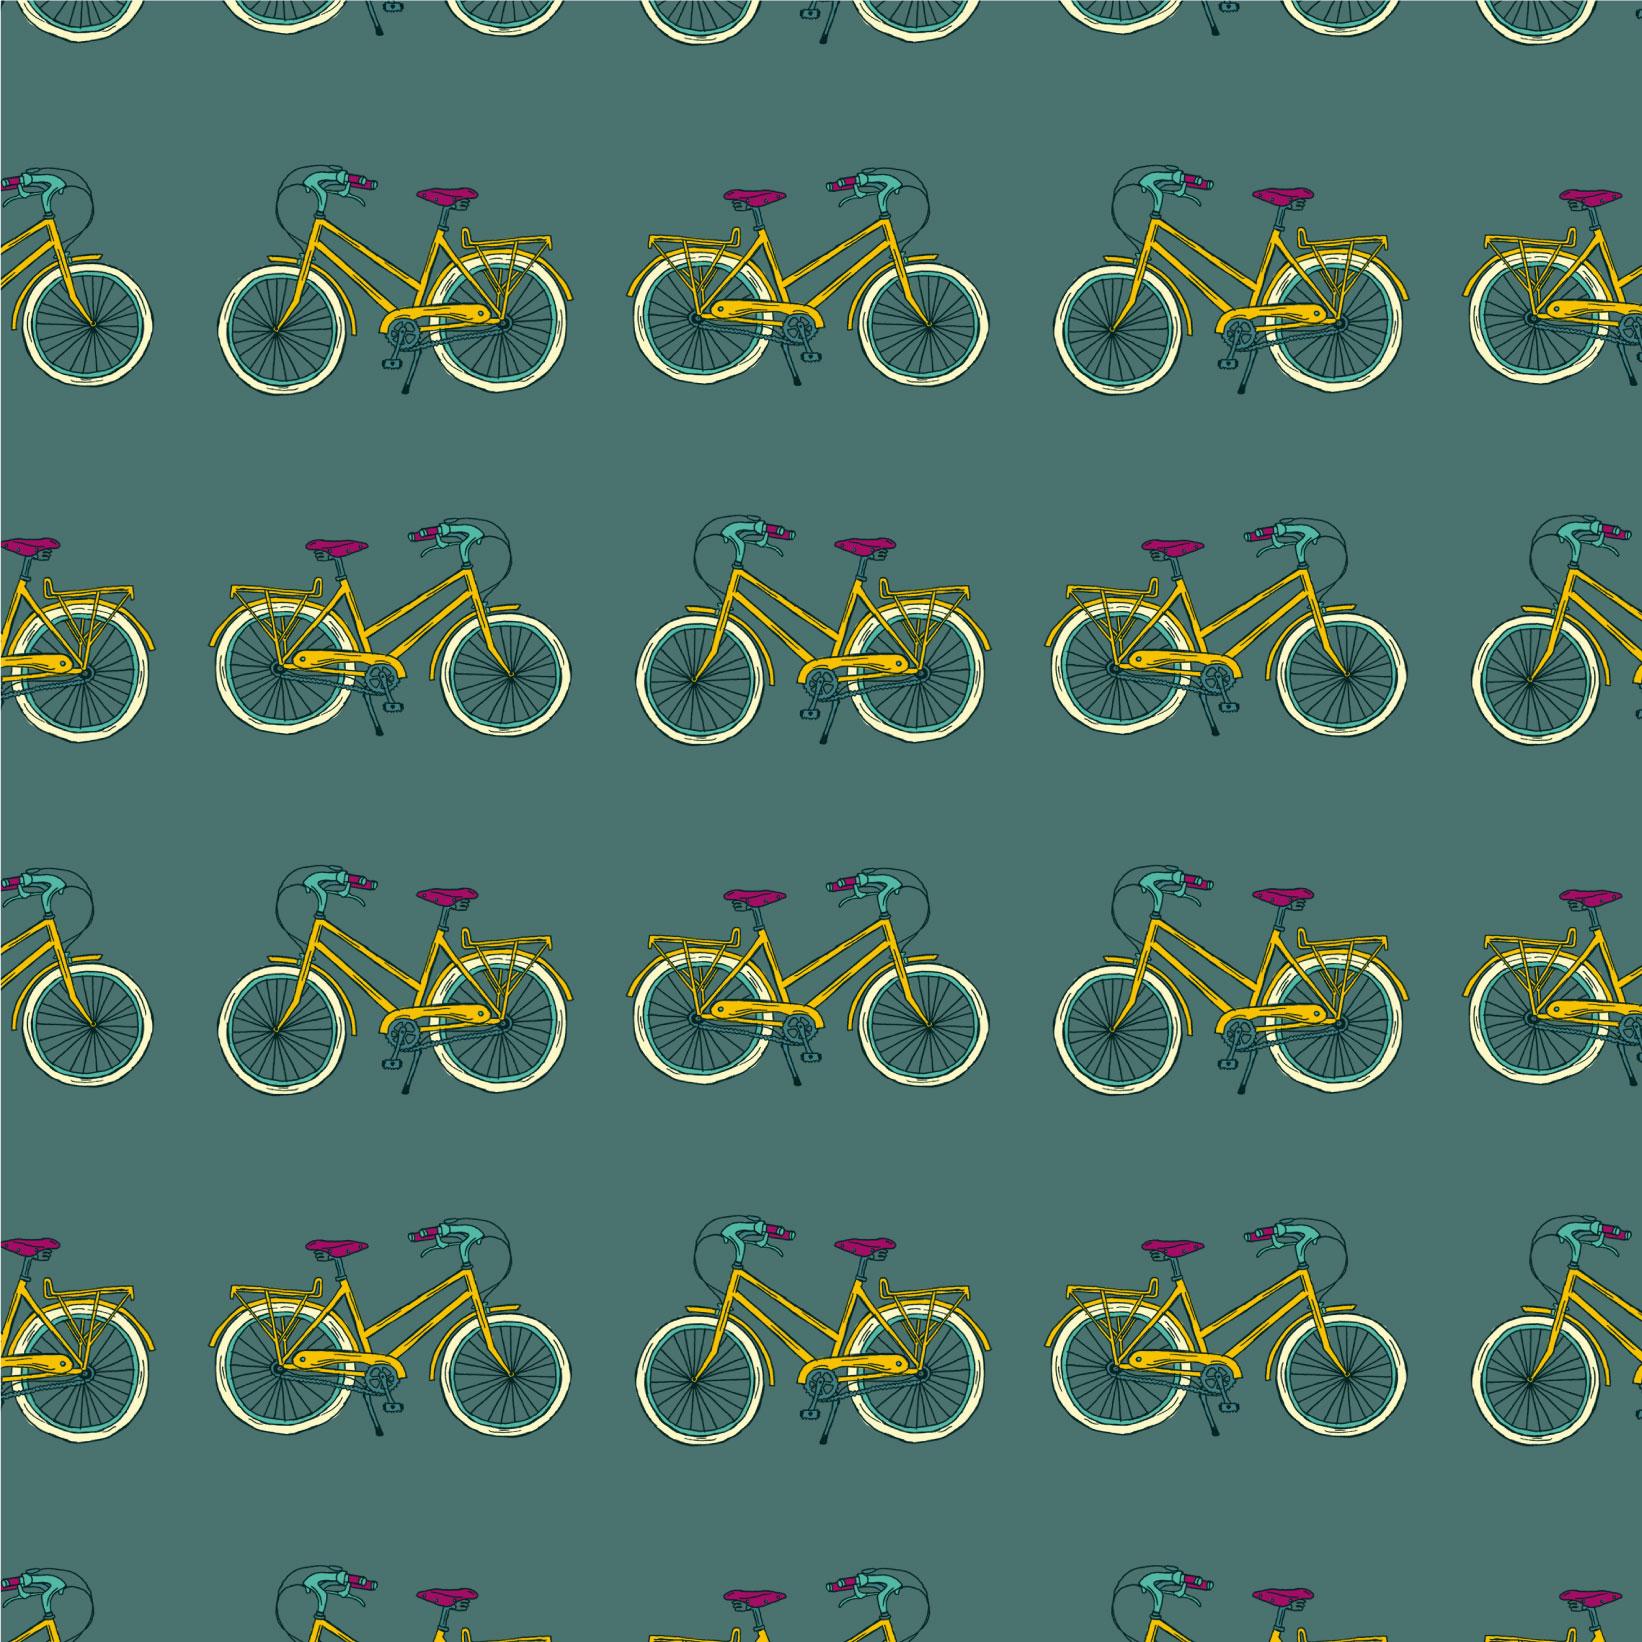 bikes-pattern-swatch.jpg